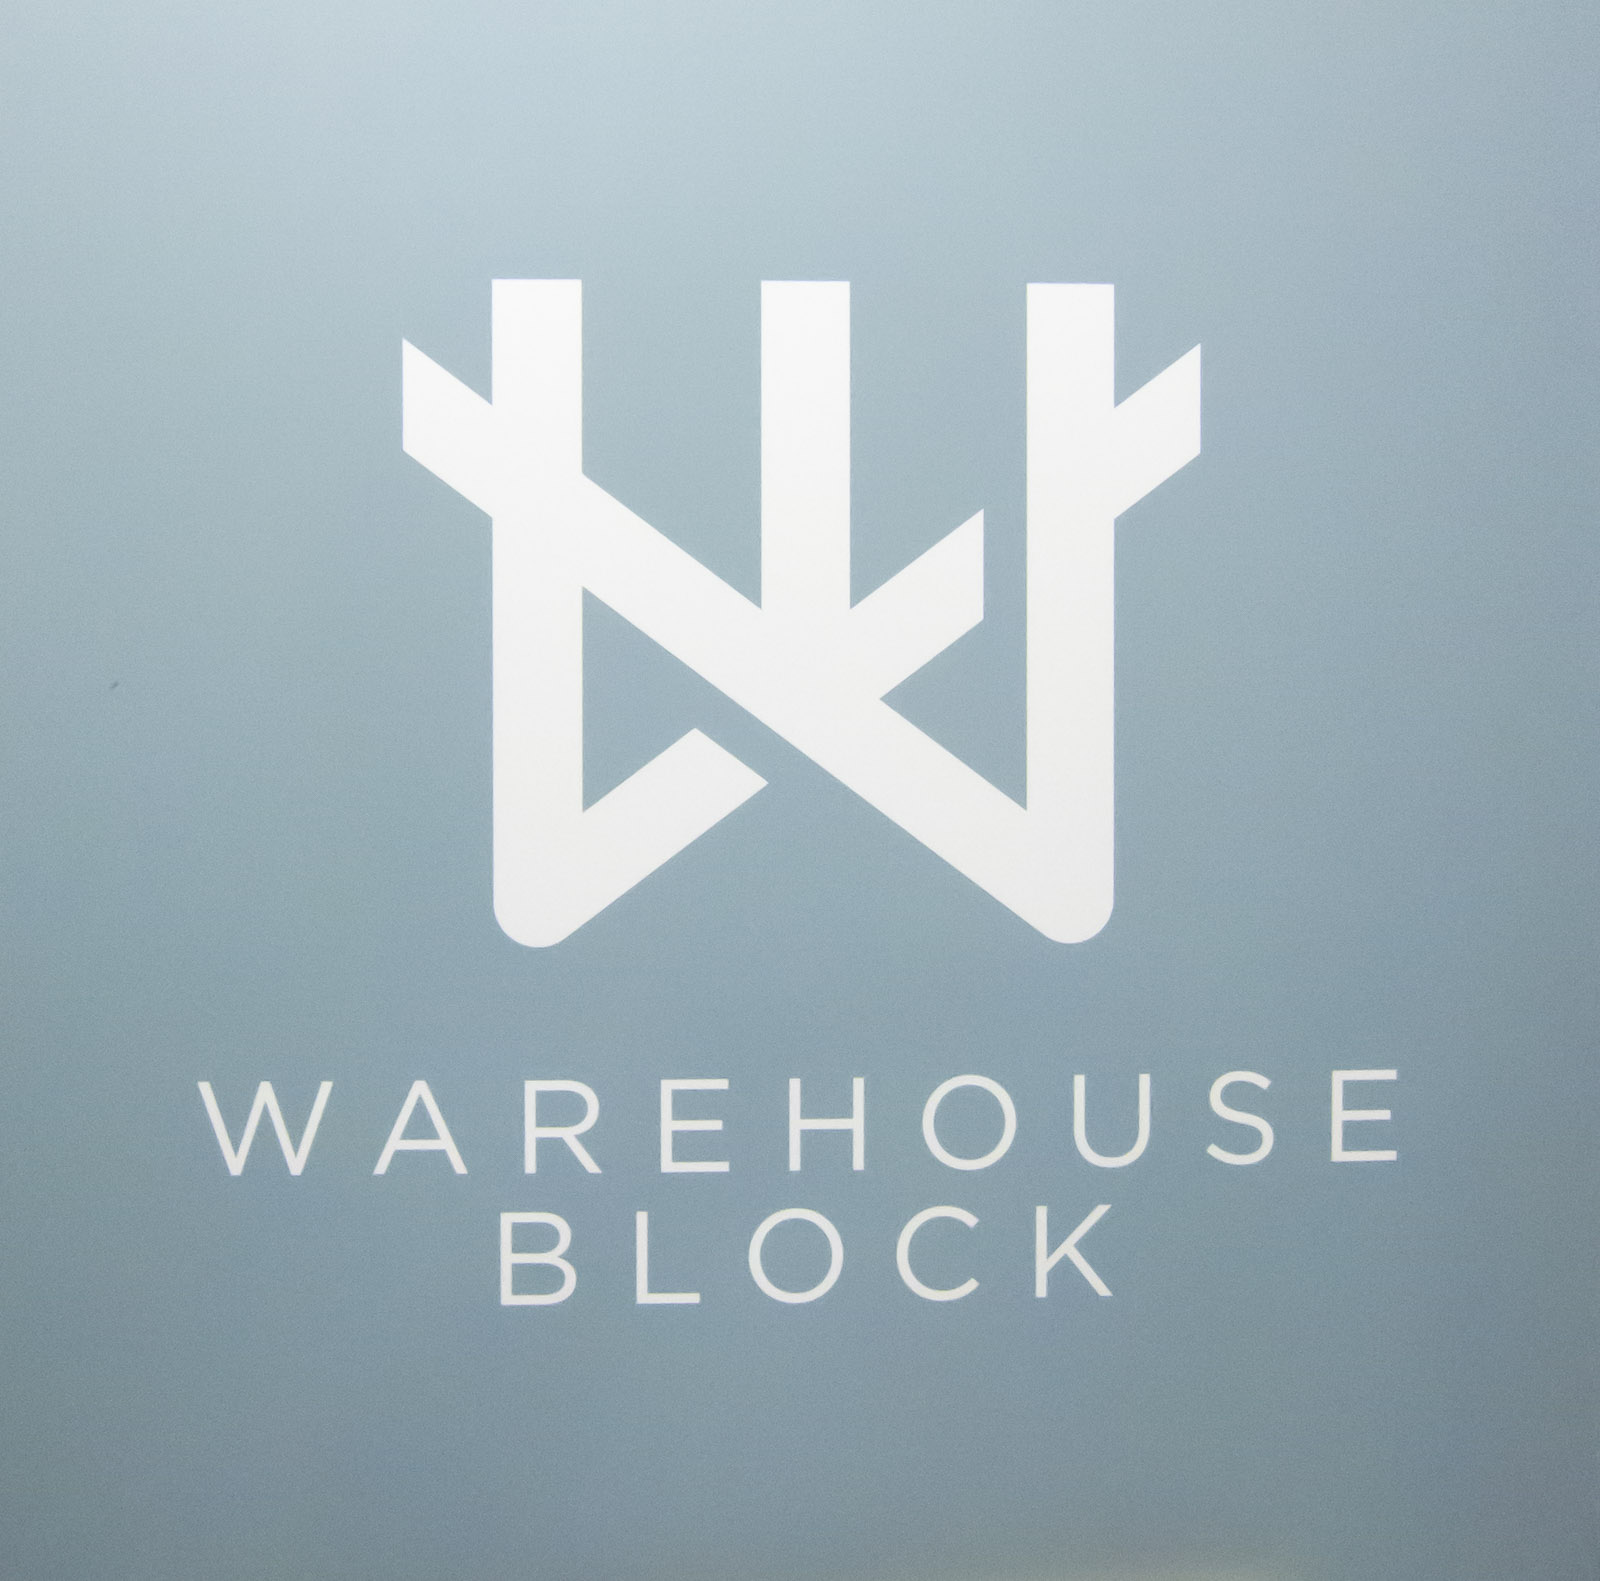 Warehouse Block logo